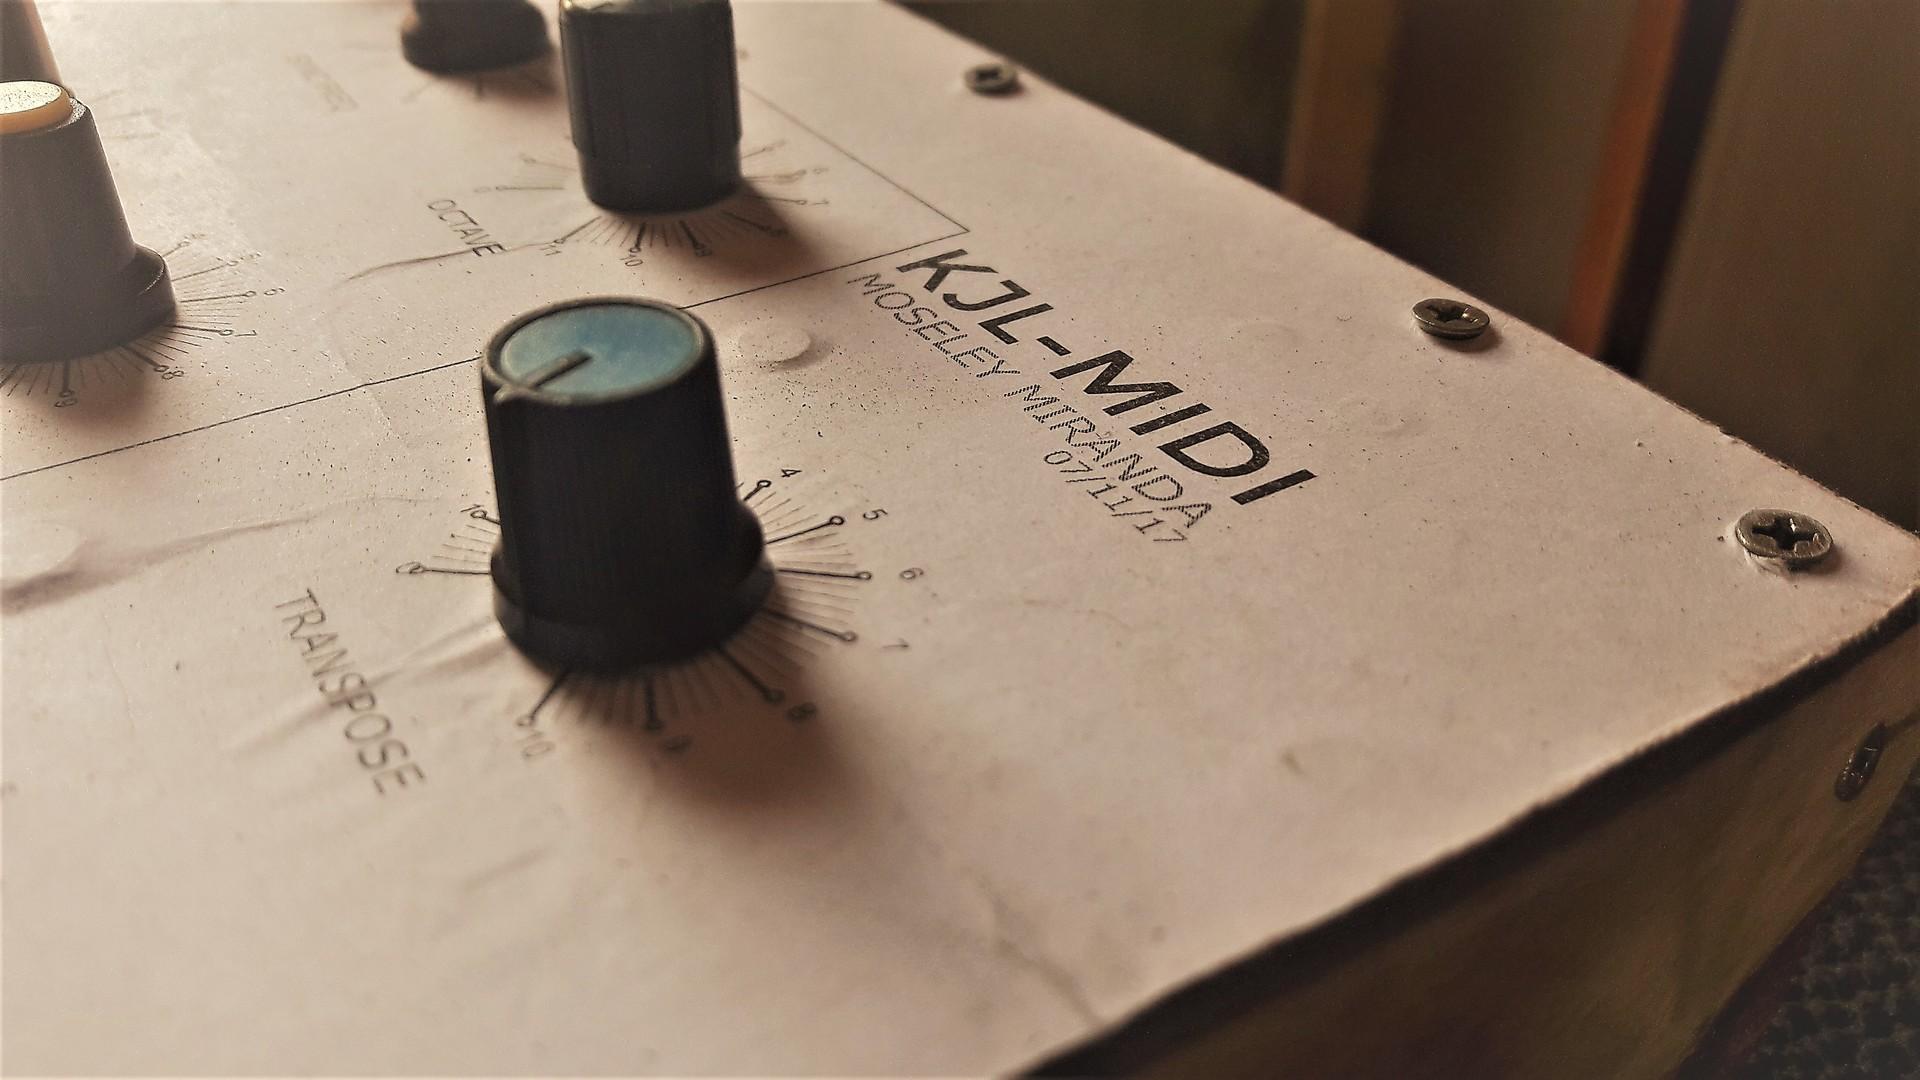 Moseley miranda goes 20171211 123250 2